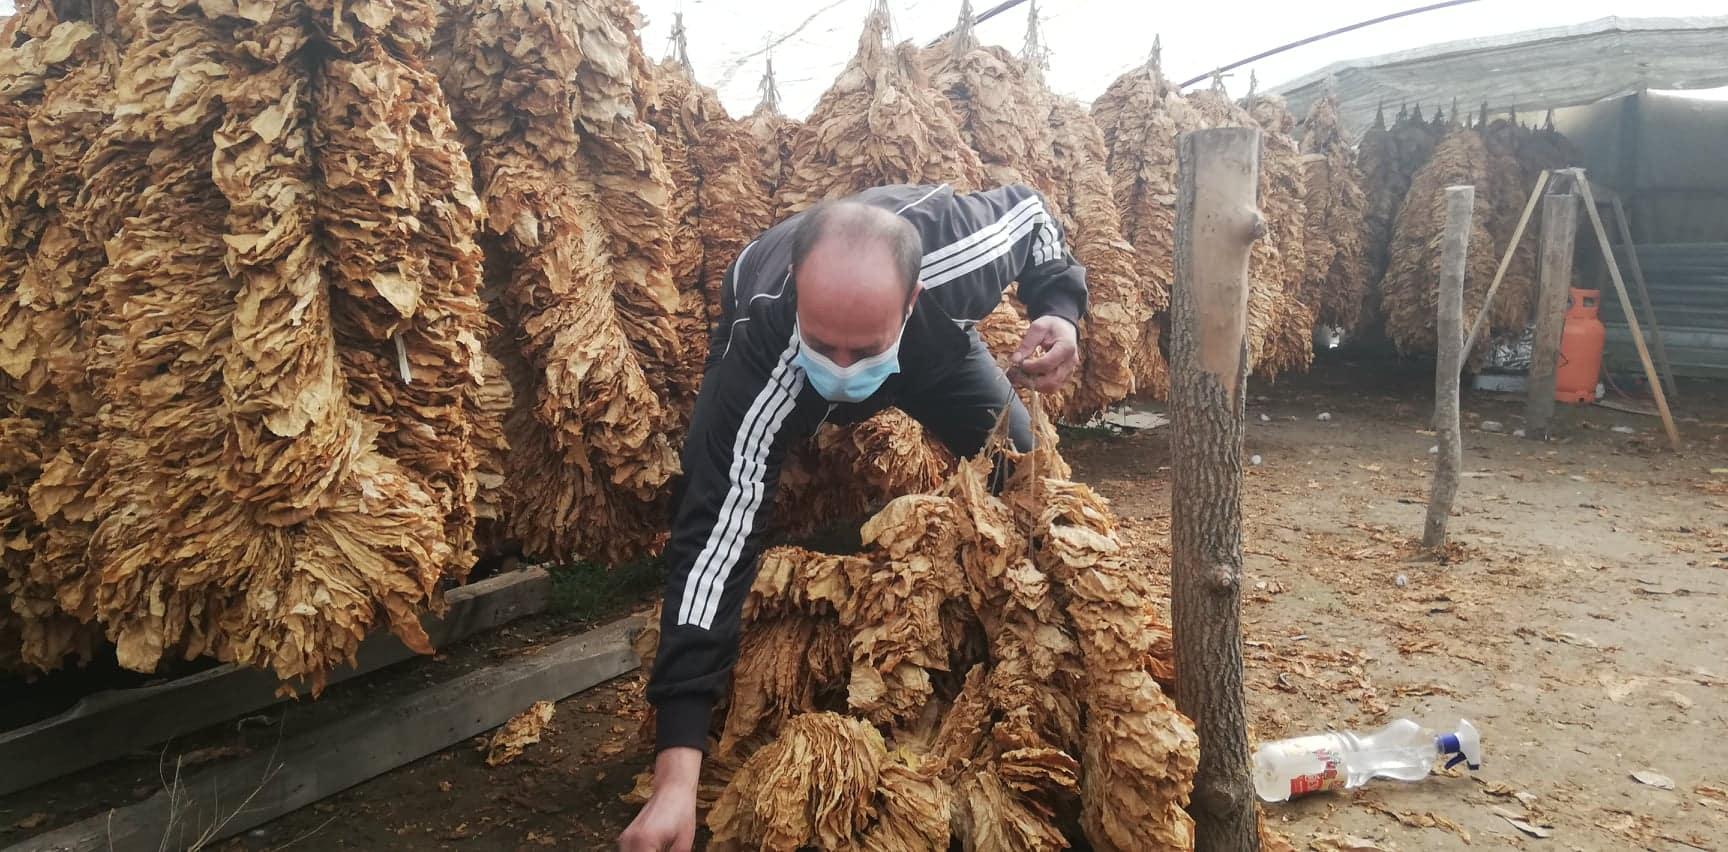 Тони тутун остана неоткупен во струмичко, тутунарите бараат откупот да продолжи до 31 март